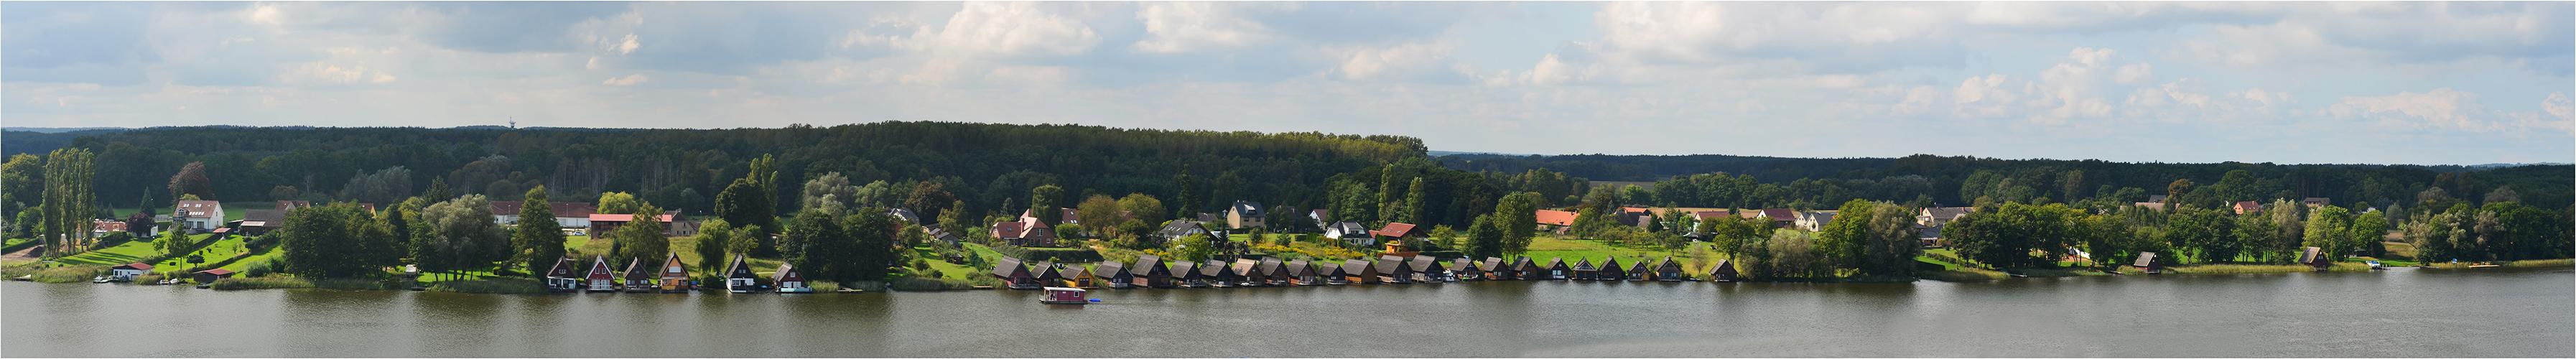 Die Bootshäuser am Mirower See